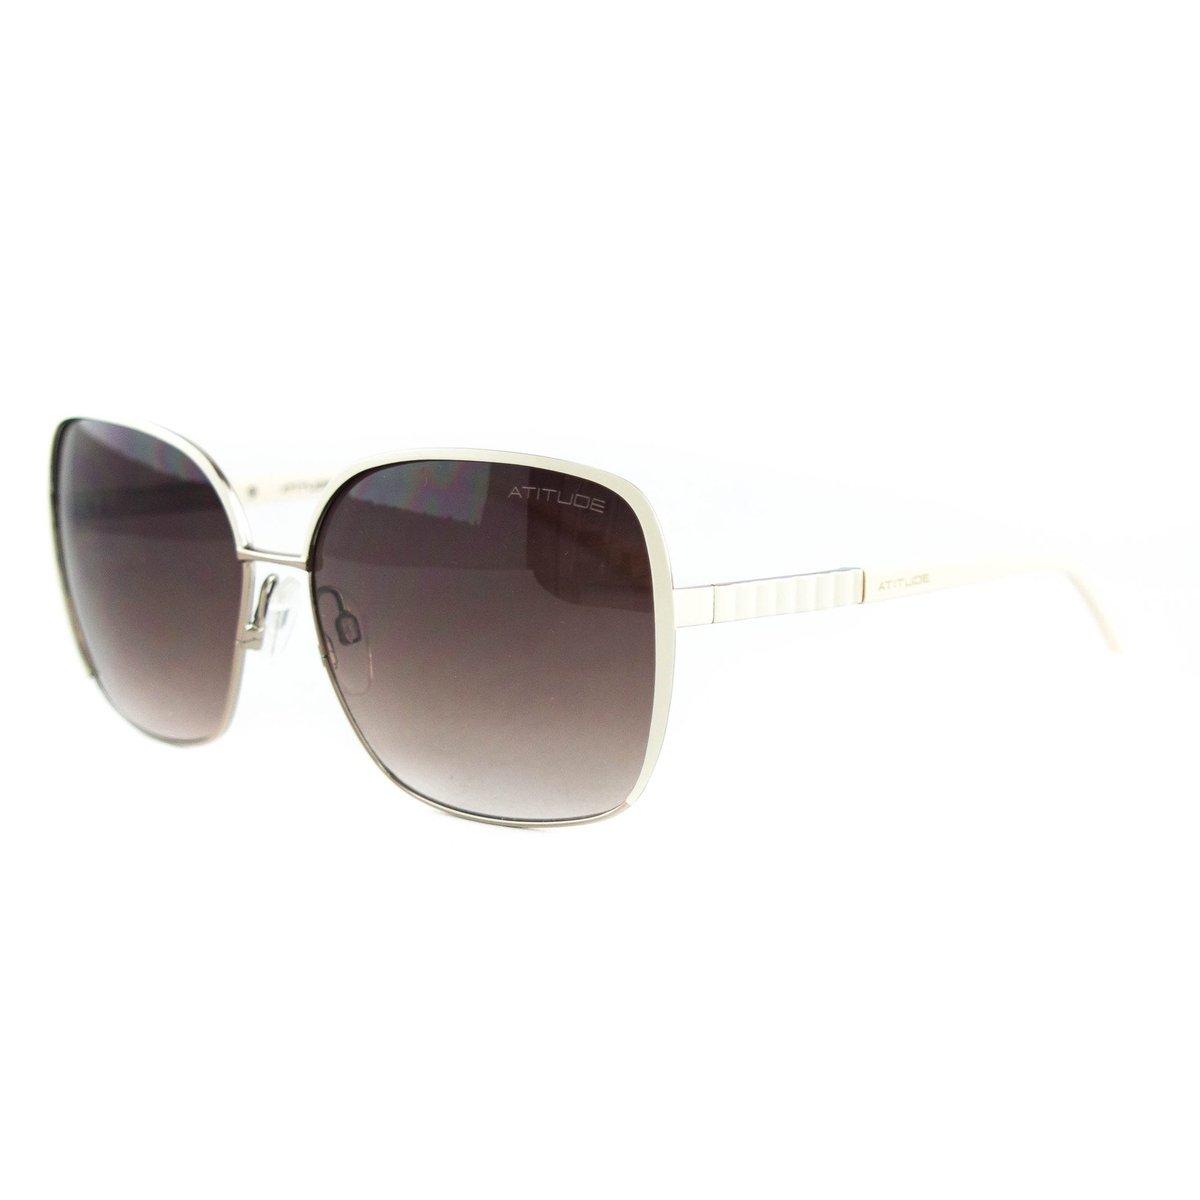 9fe7565195ae9 Óculos de Sol Atitude - Compre Agora